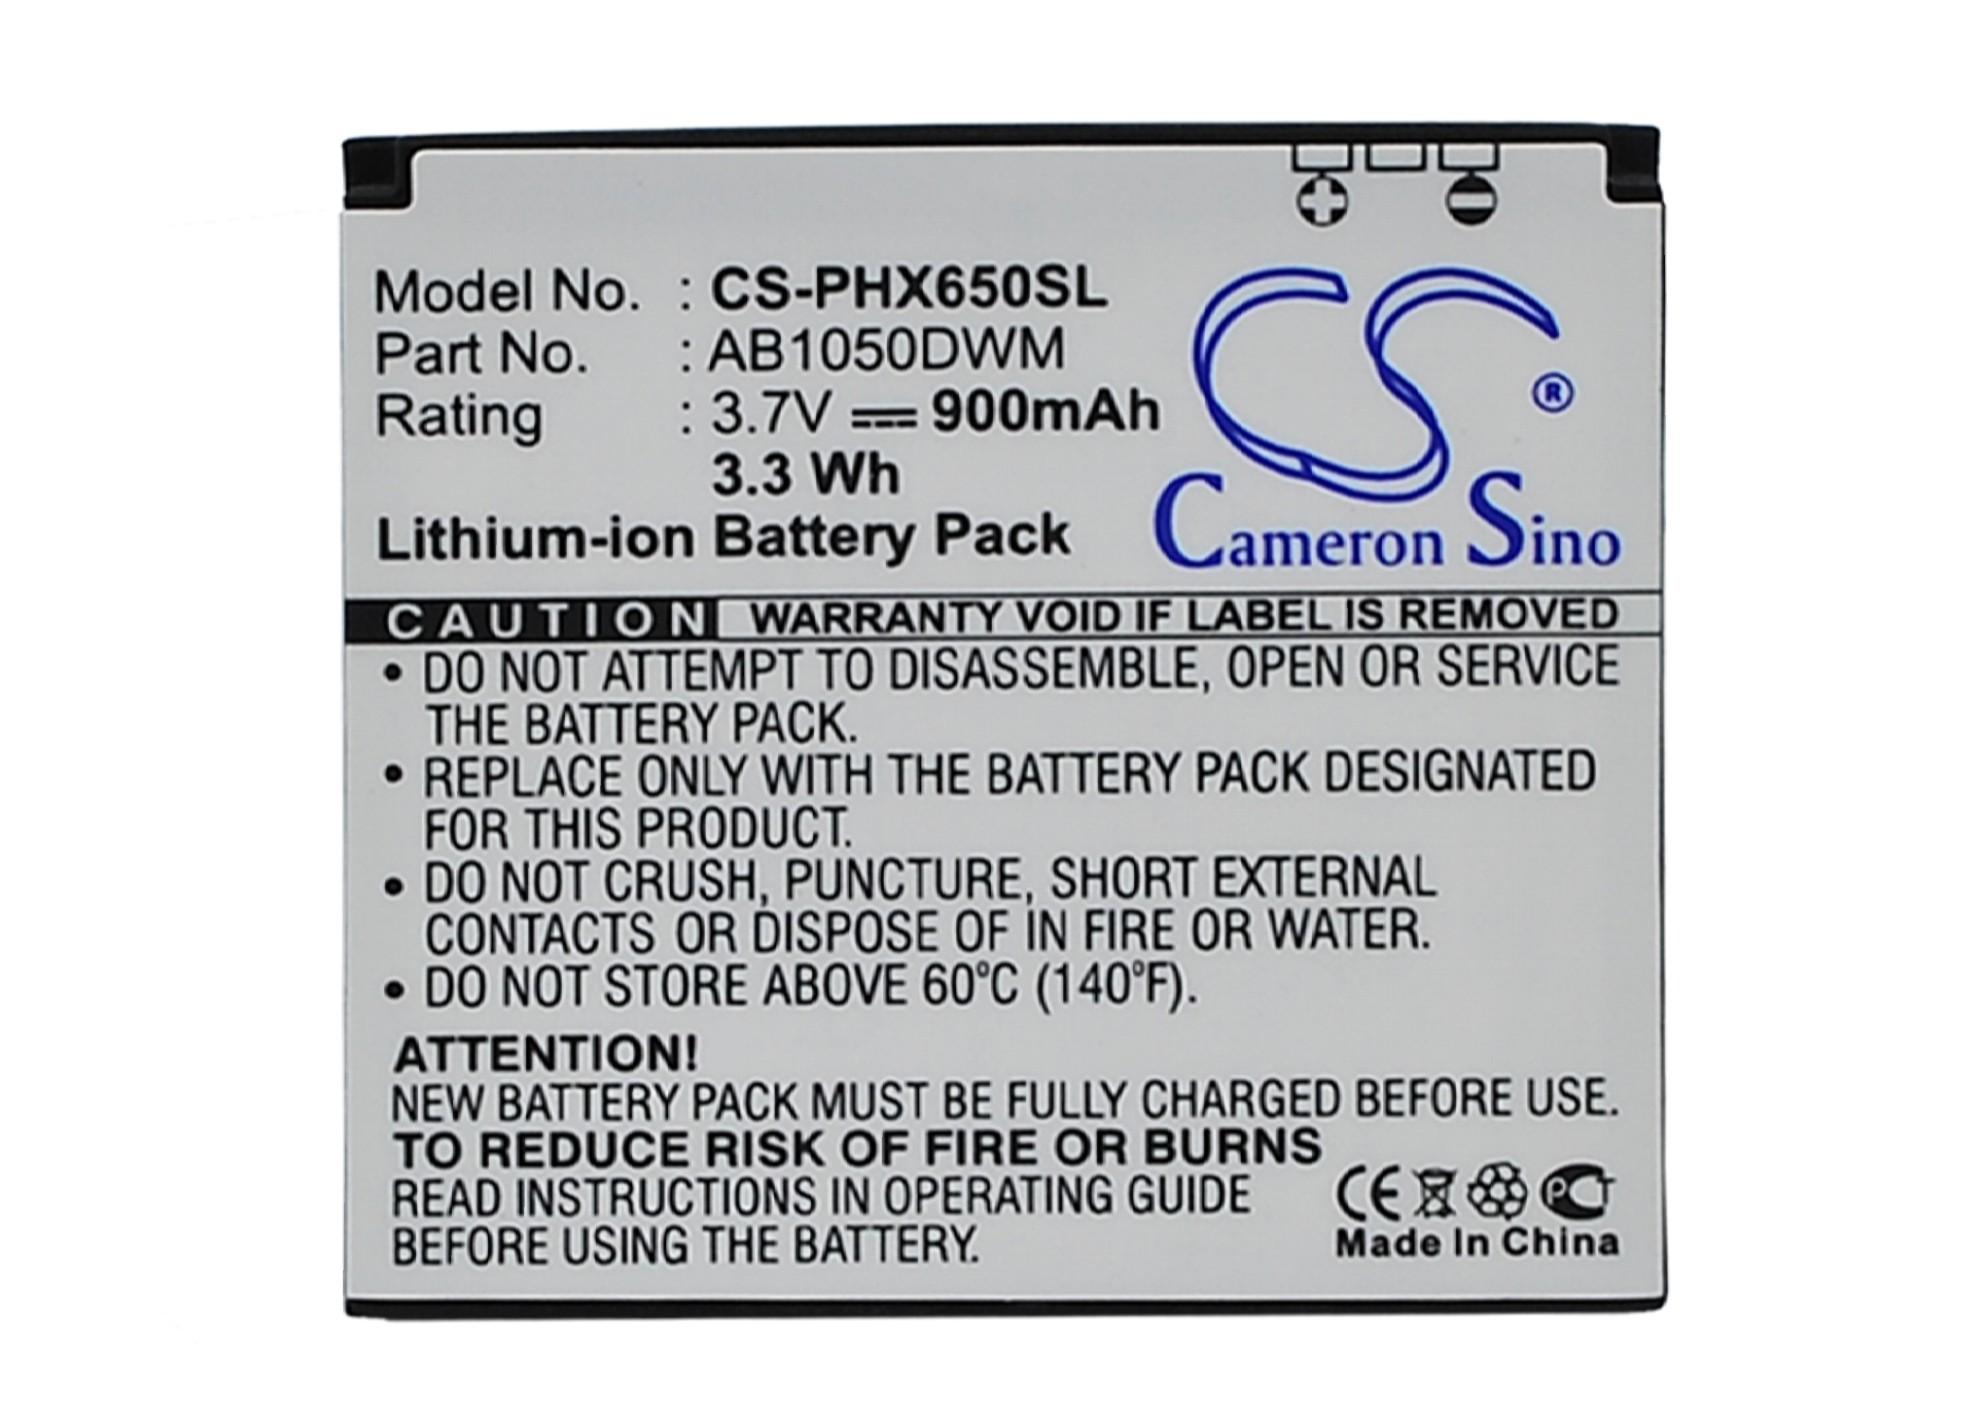 Cameron Sino baterie do mobilů pro PHILIPS Xenium X712 3.7V Li-ion 900mAh černá - neoriginální